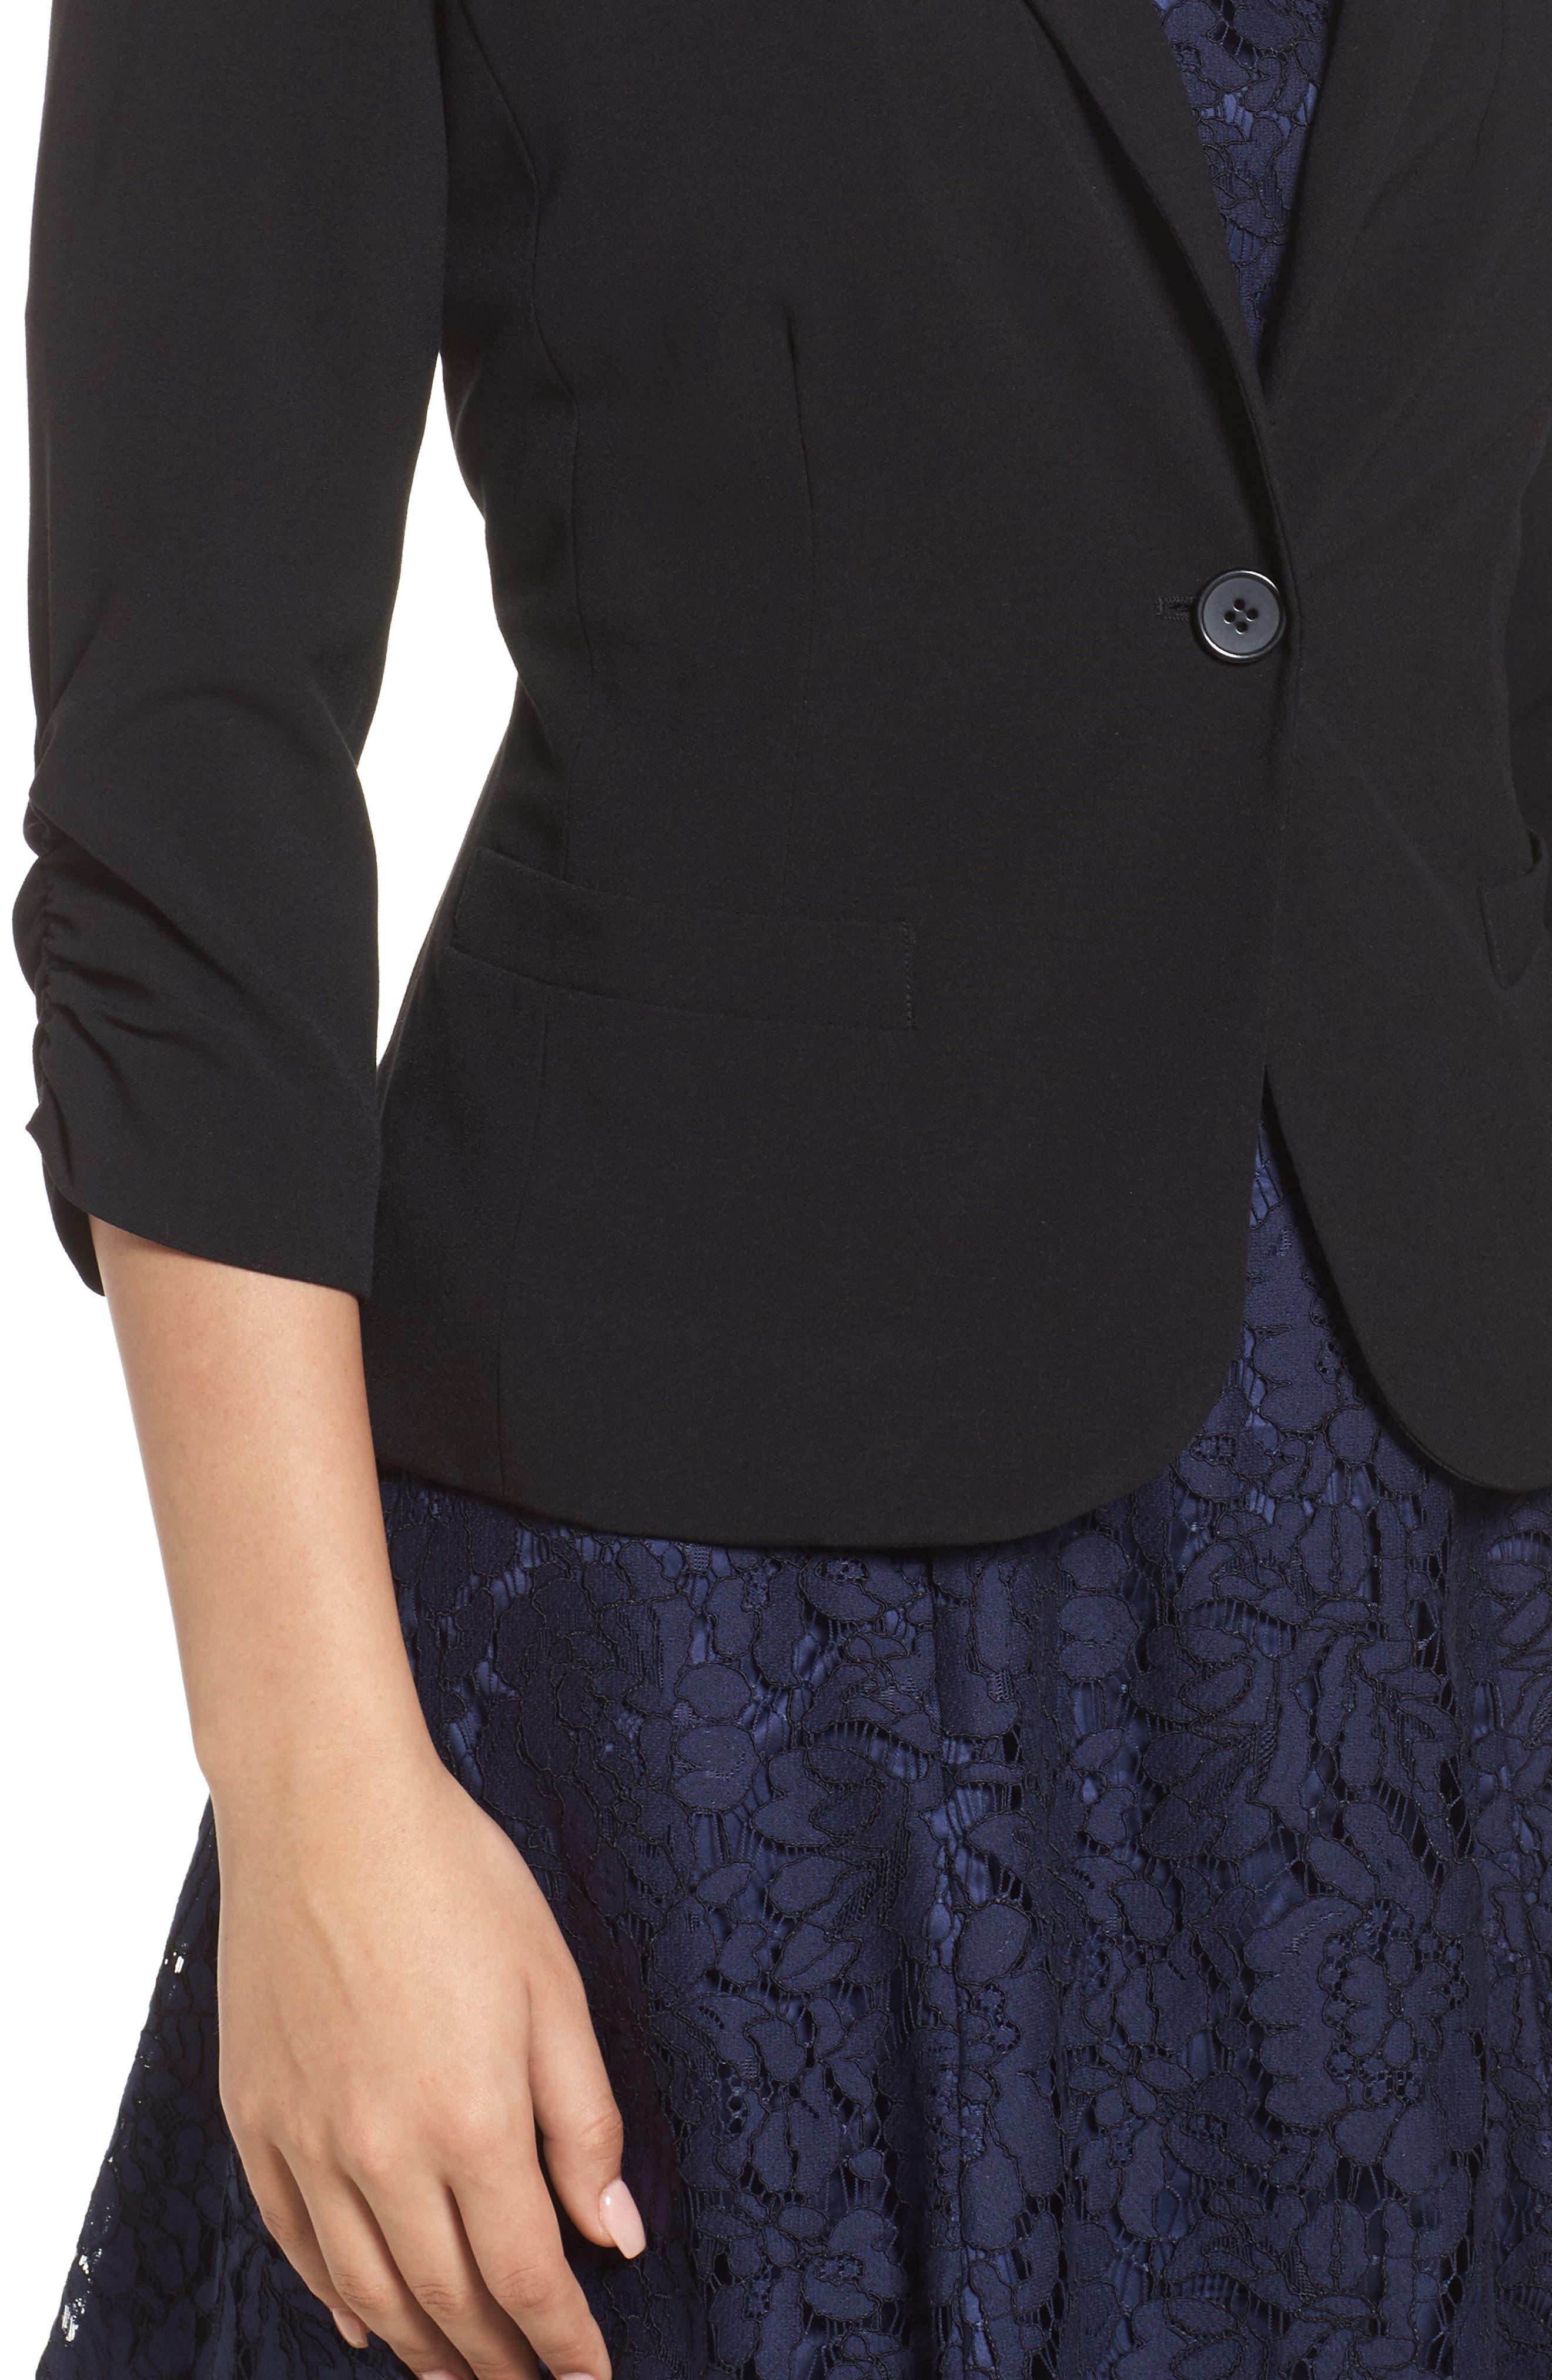 Ruched Sleeve Blazer,                             Alternate thumbnail 4, color,                             Black